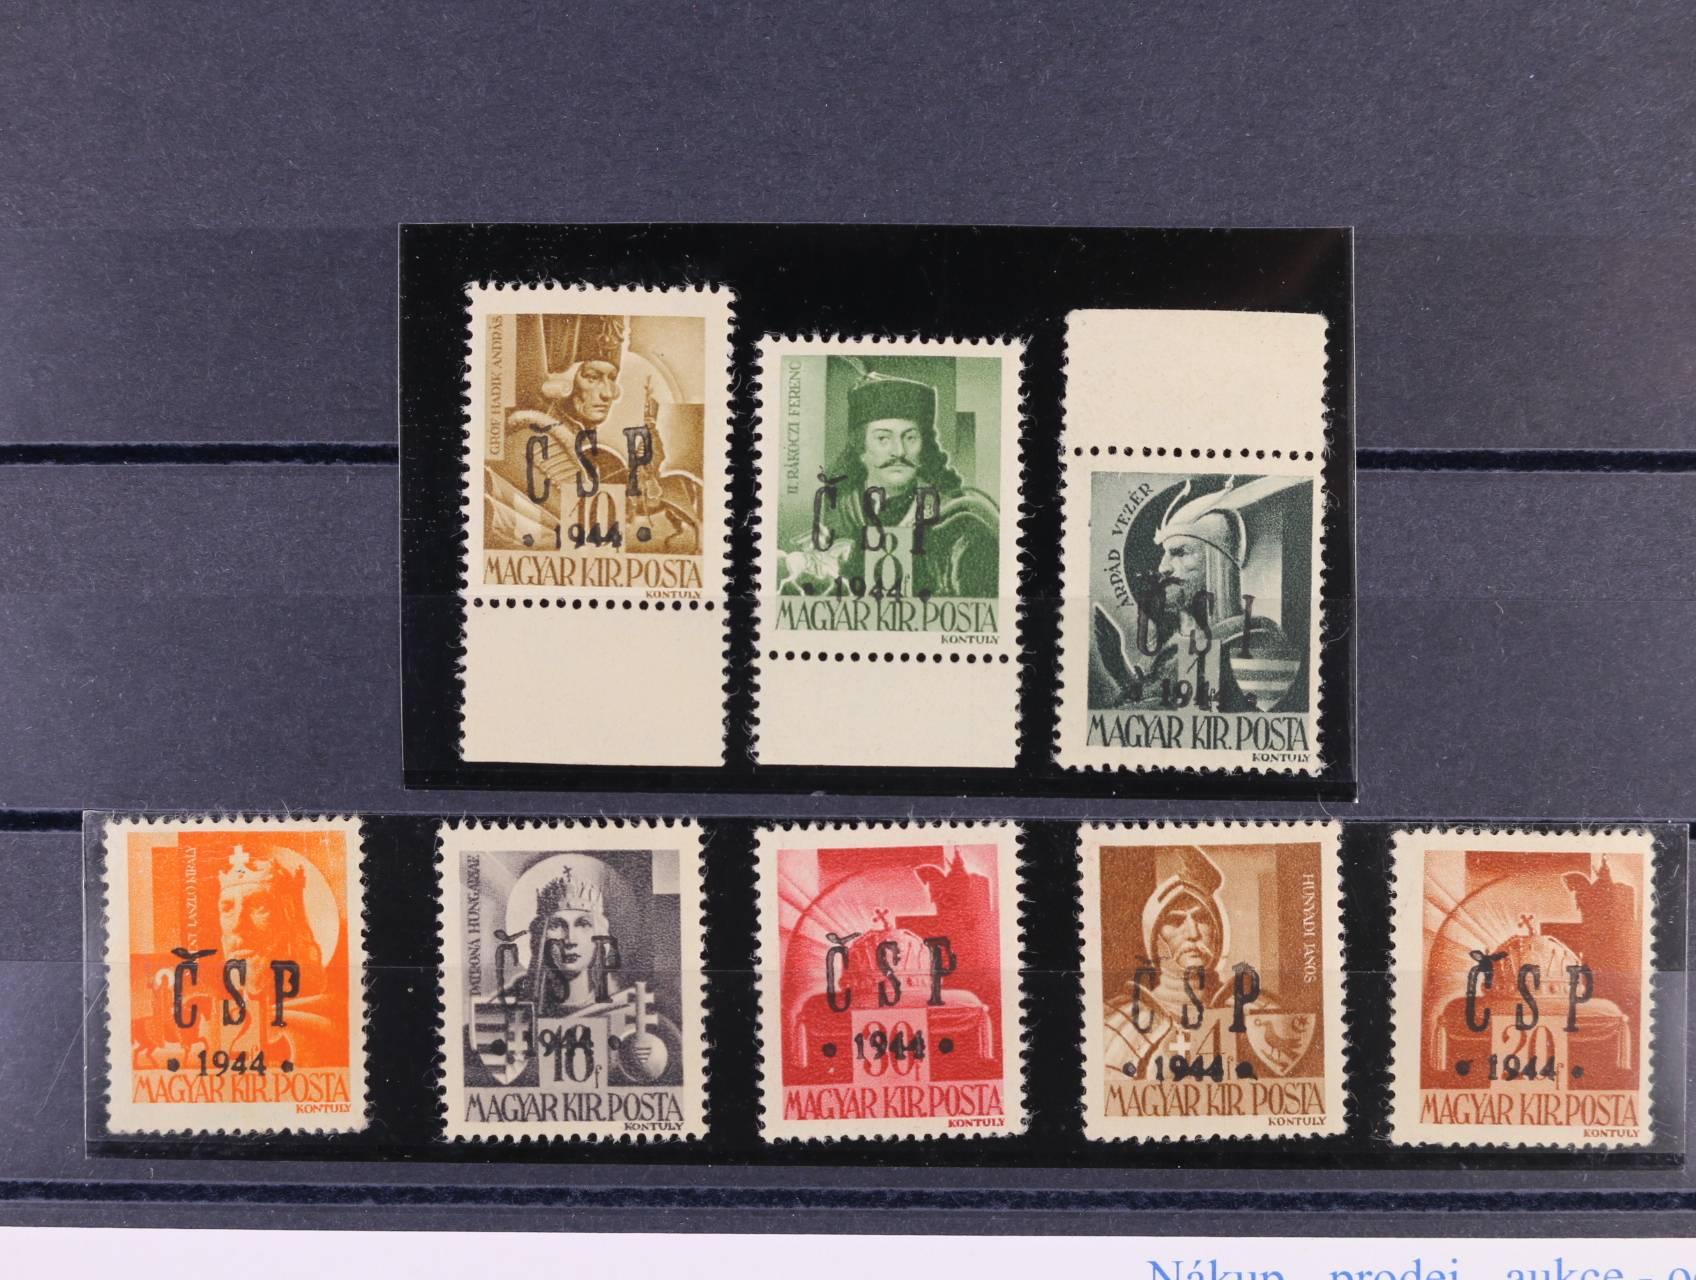 Chust - zn. RV 174 - 5, 177, 179, 181, 183 - 4, 186, kat. cena 1100 Kč